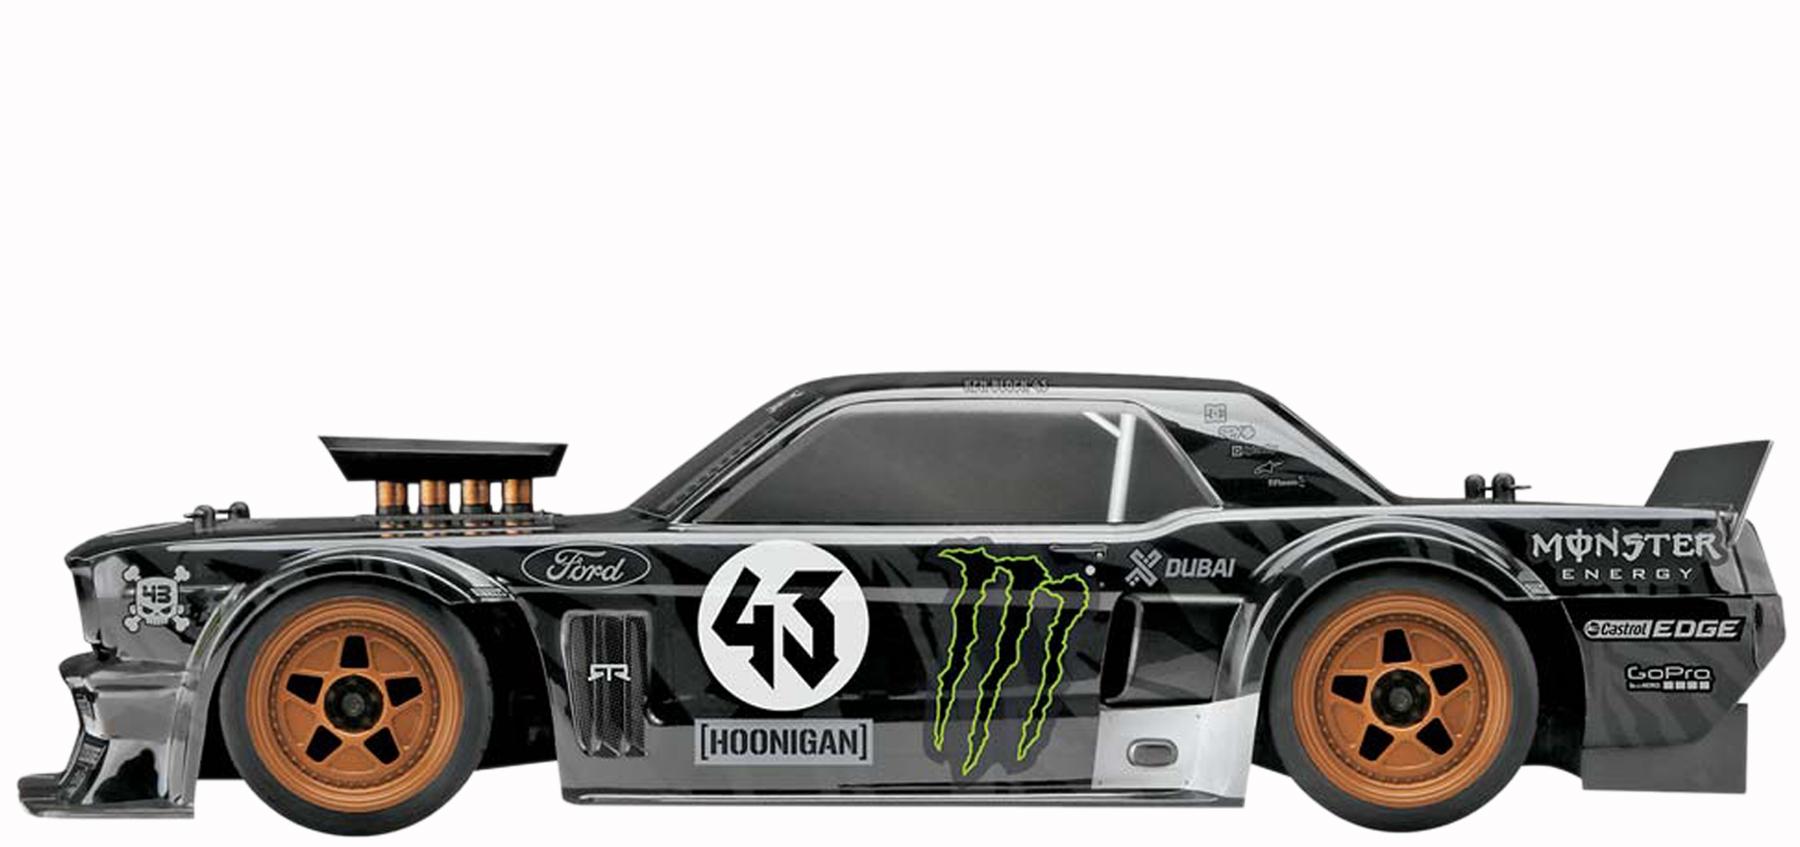 Ford Racing Parts >> HPI Ken Block 1965 Ford Mustang Hoonicorn RTR | HPI115990 | HPI115990 | BMI Karts And Parts